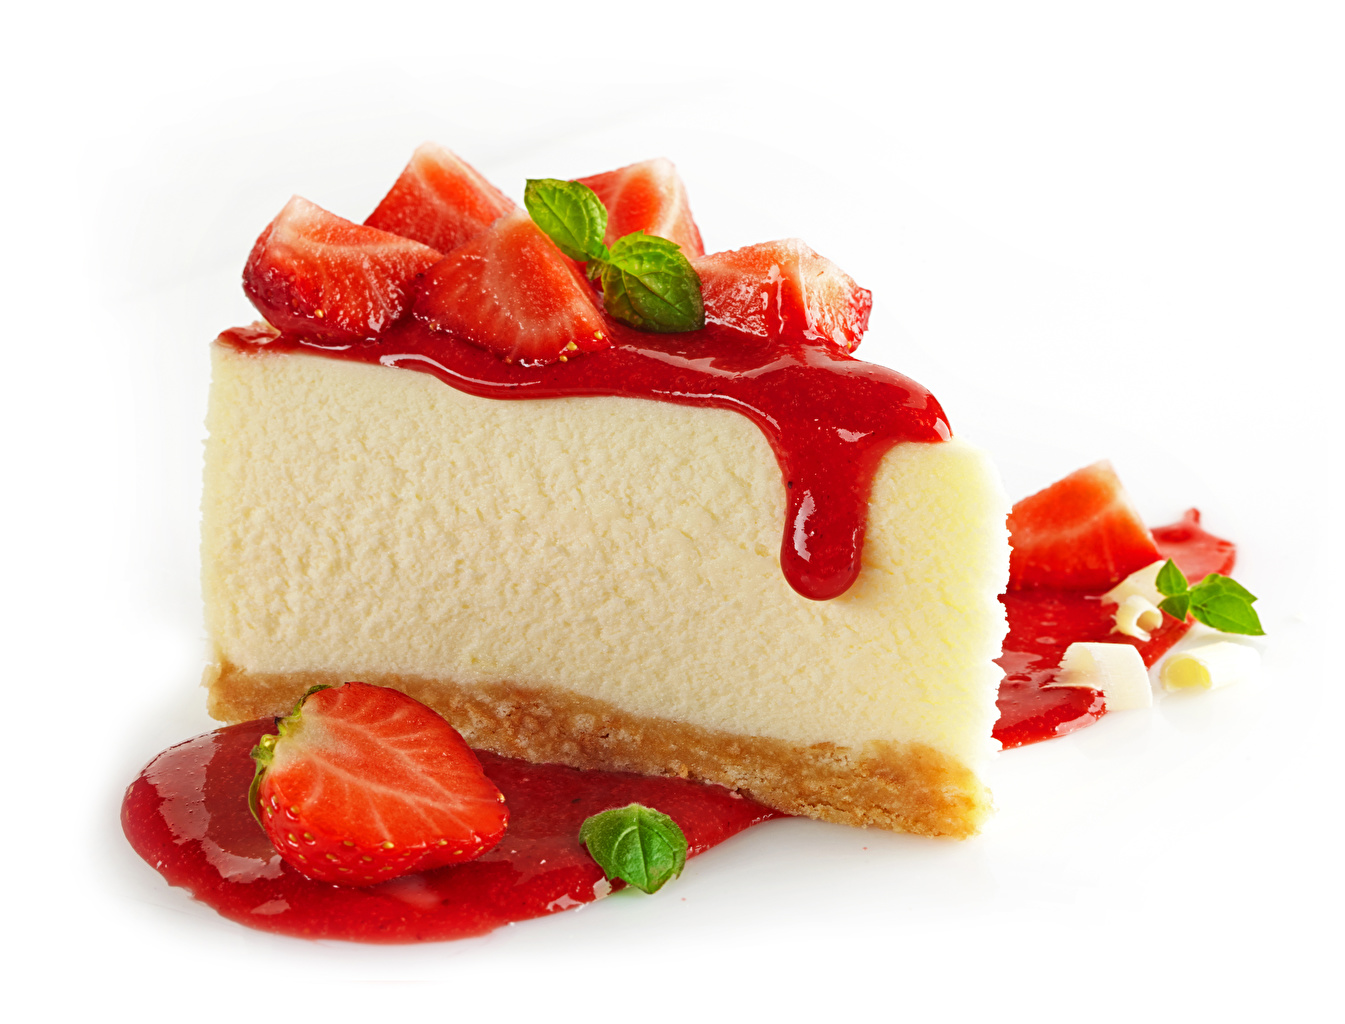 Pictures Fruit preserves Strawberry Food Cake Sweets White background Powidl Varenye